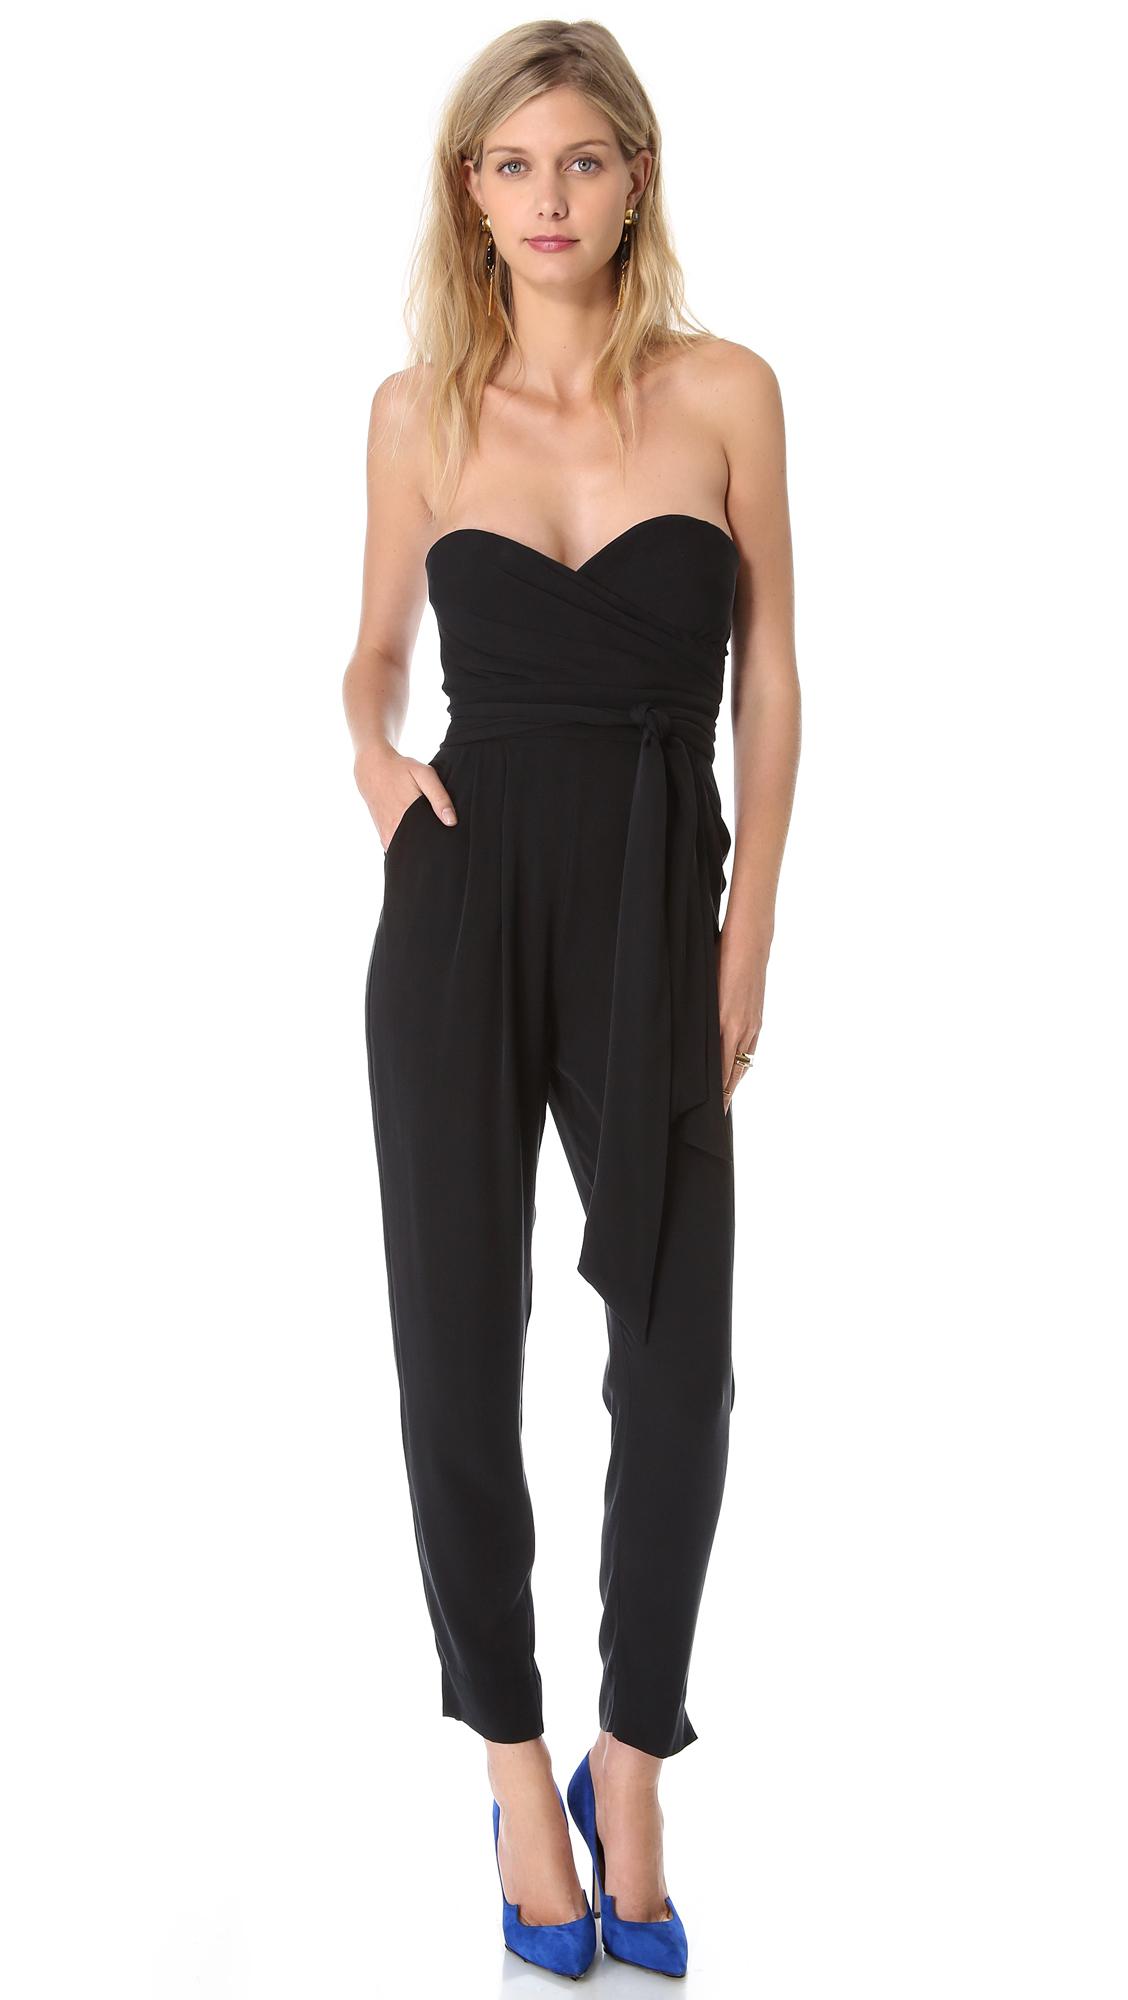 Lyst - Catherine malandrino Strapless Jumpsuit in Black